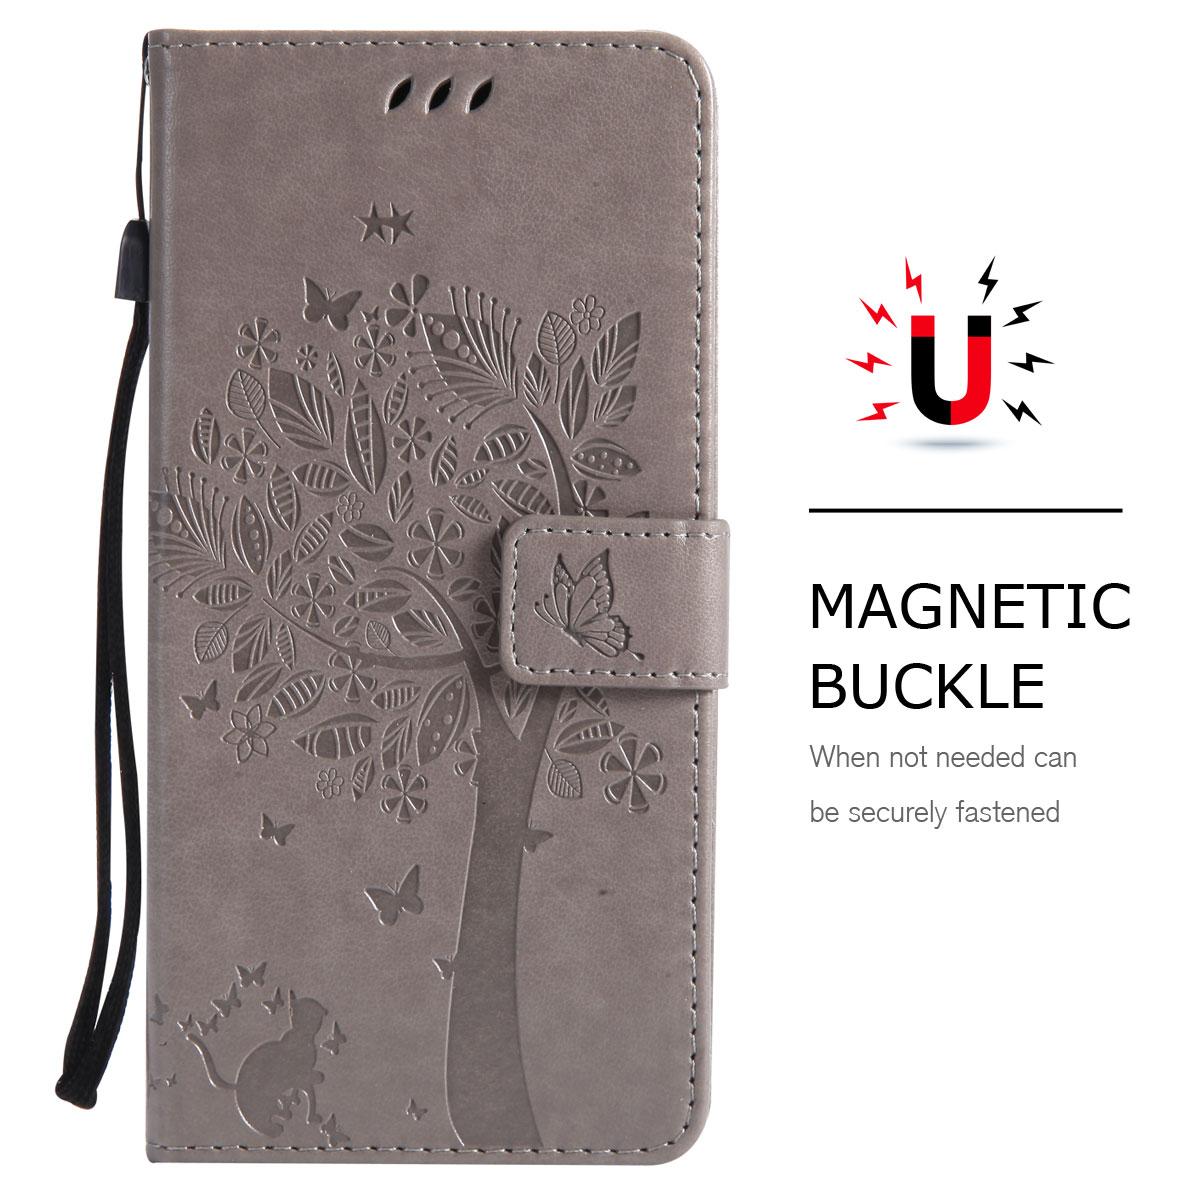 Magnetic-Leather-Credit-Card-Holder-Flip-Case-Cover-For-Google-Pixel-2-2-XL thumbnail 37